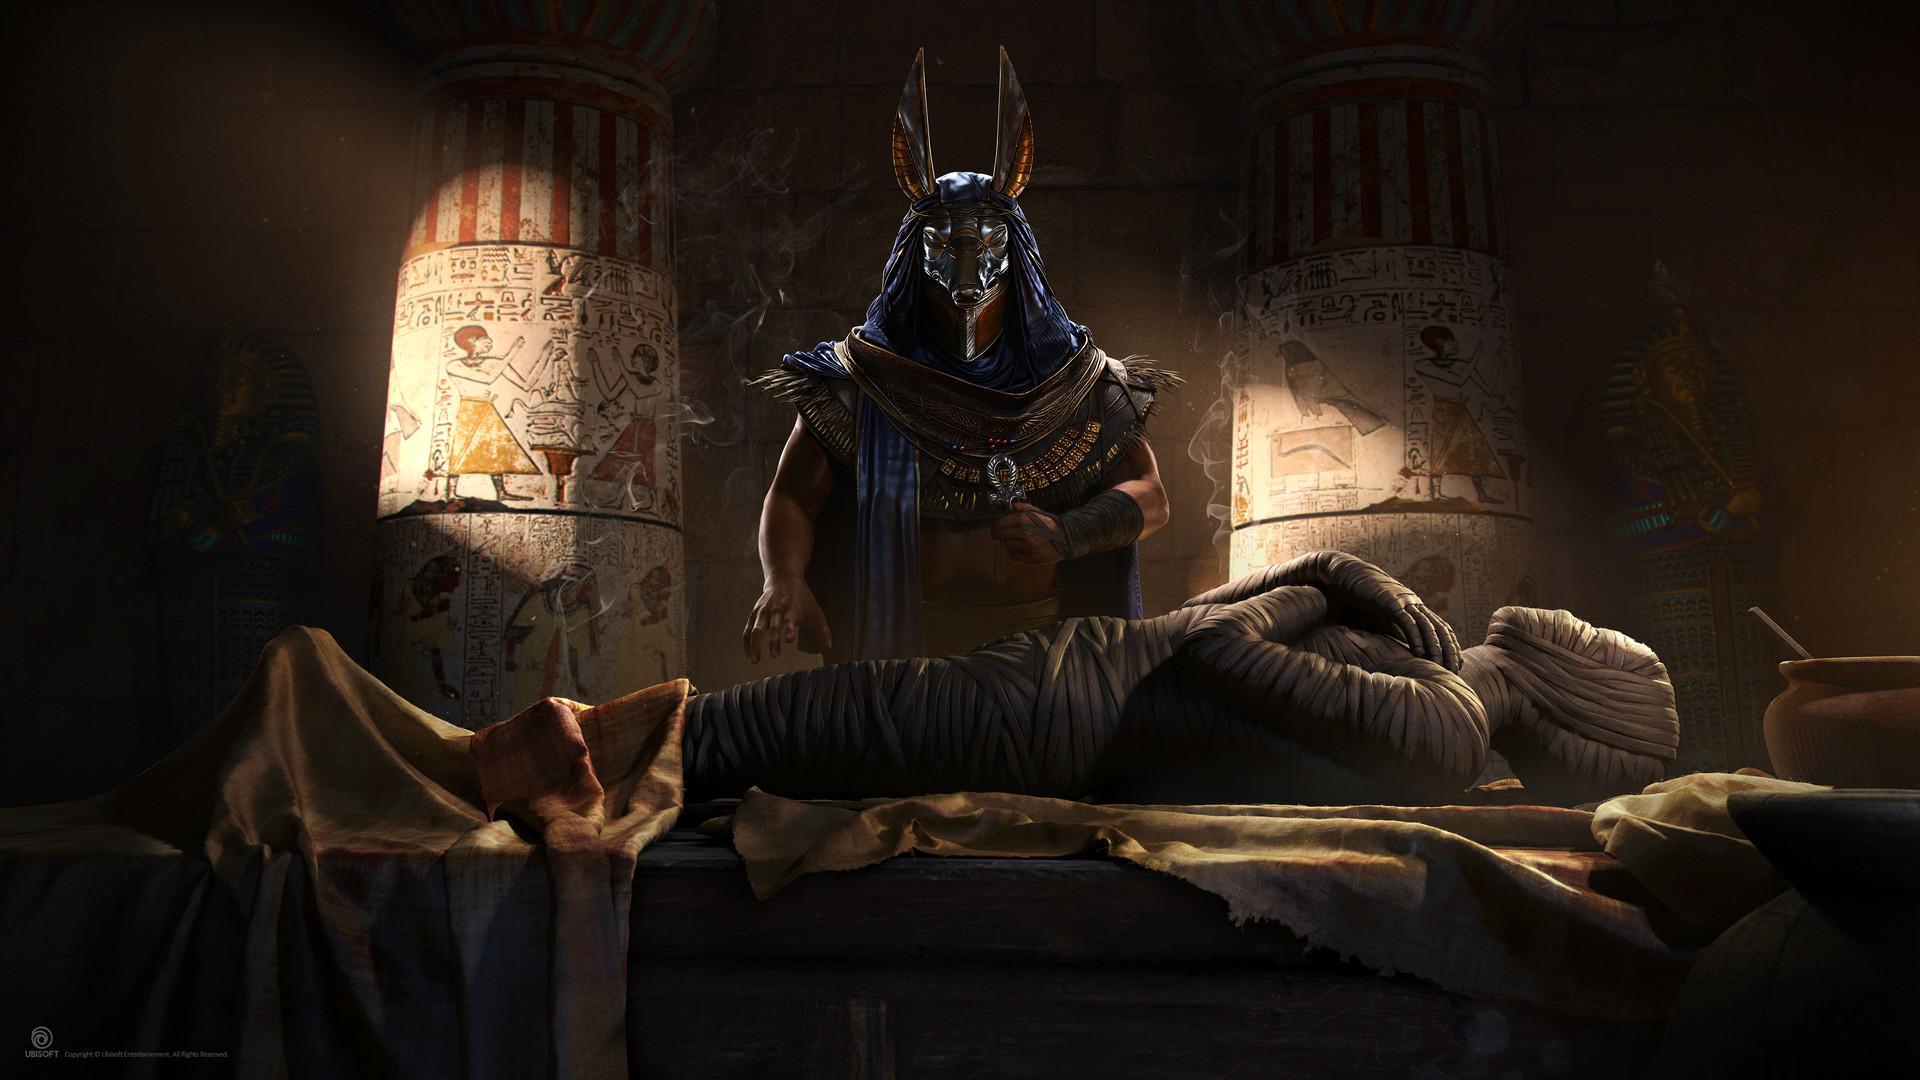 Hugo deschamps artstation mummy